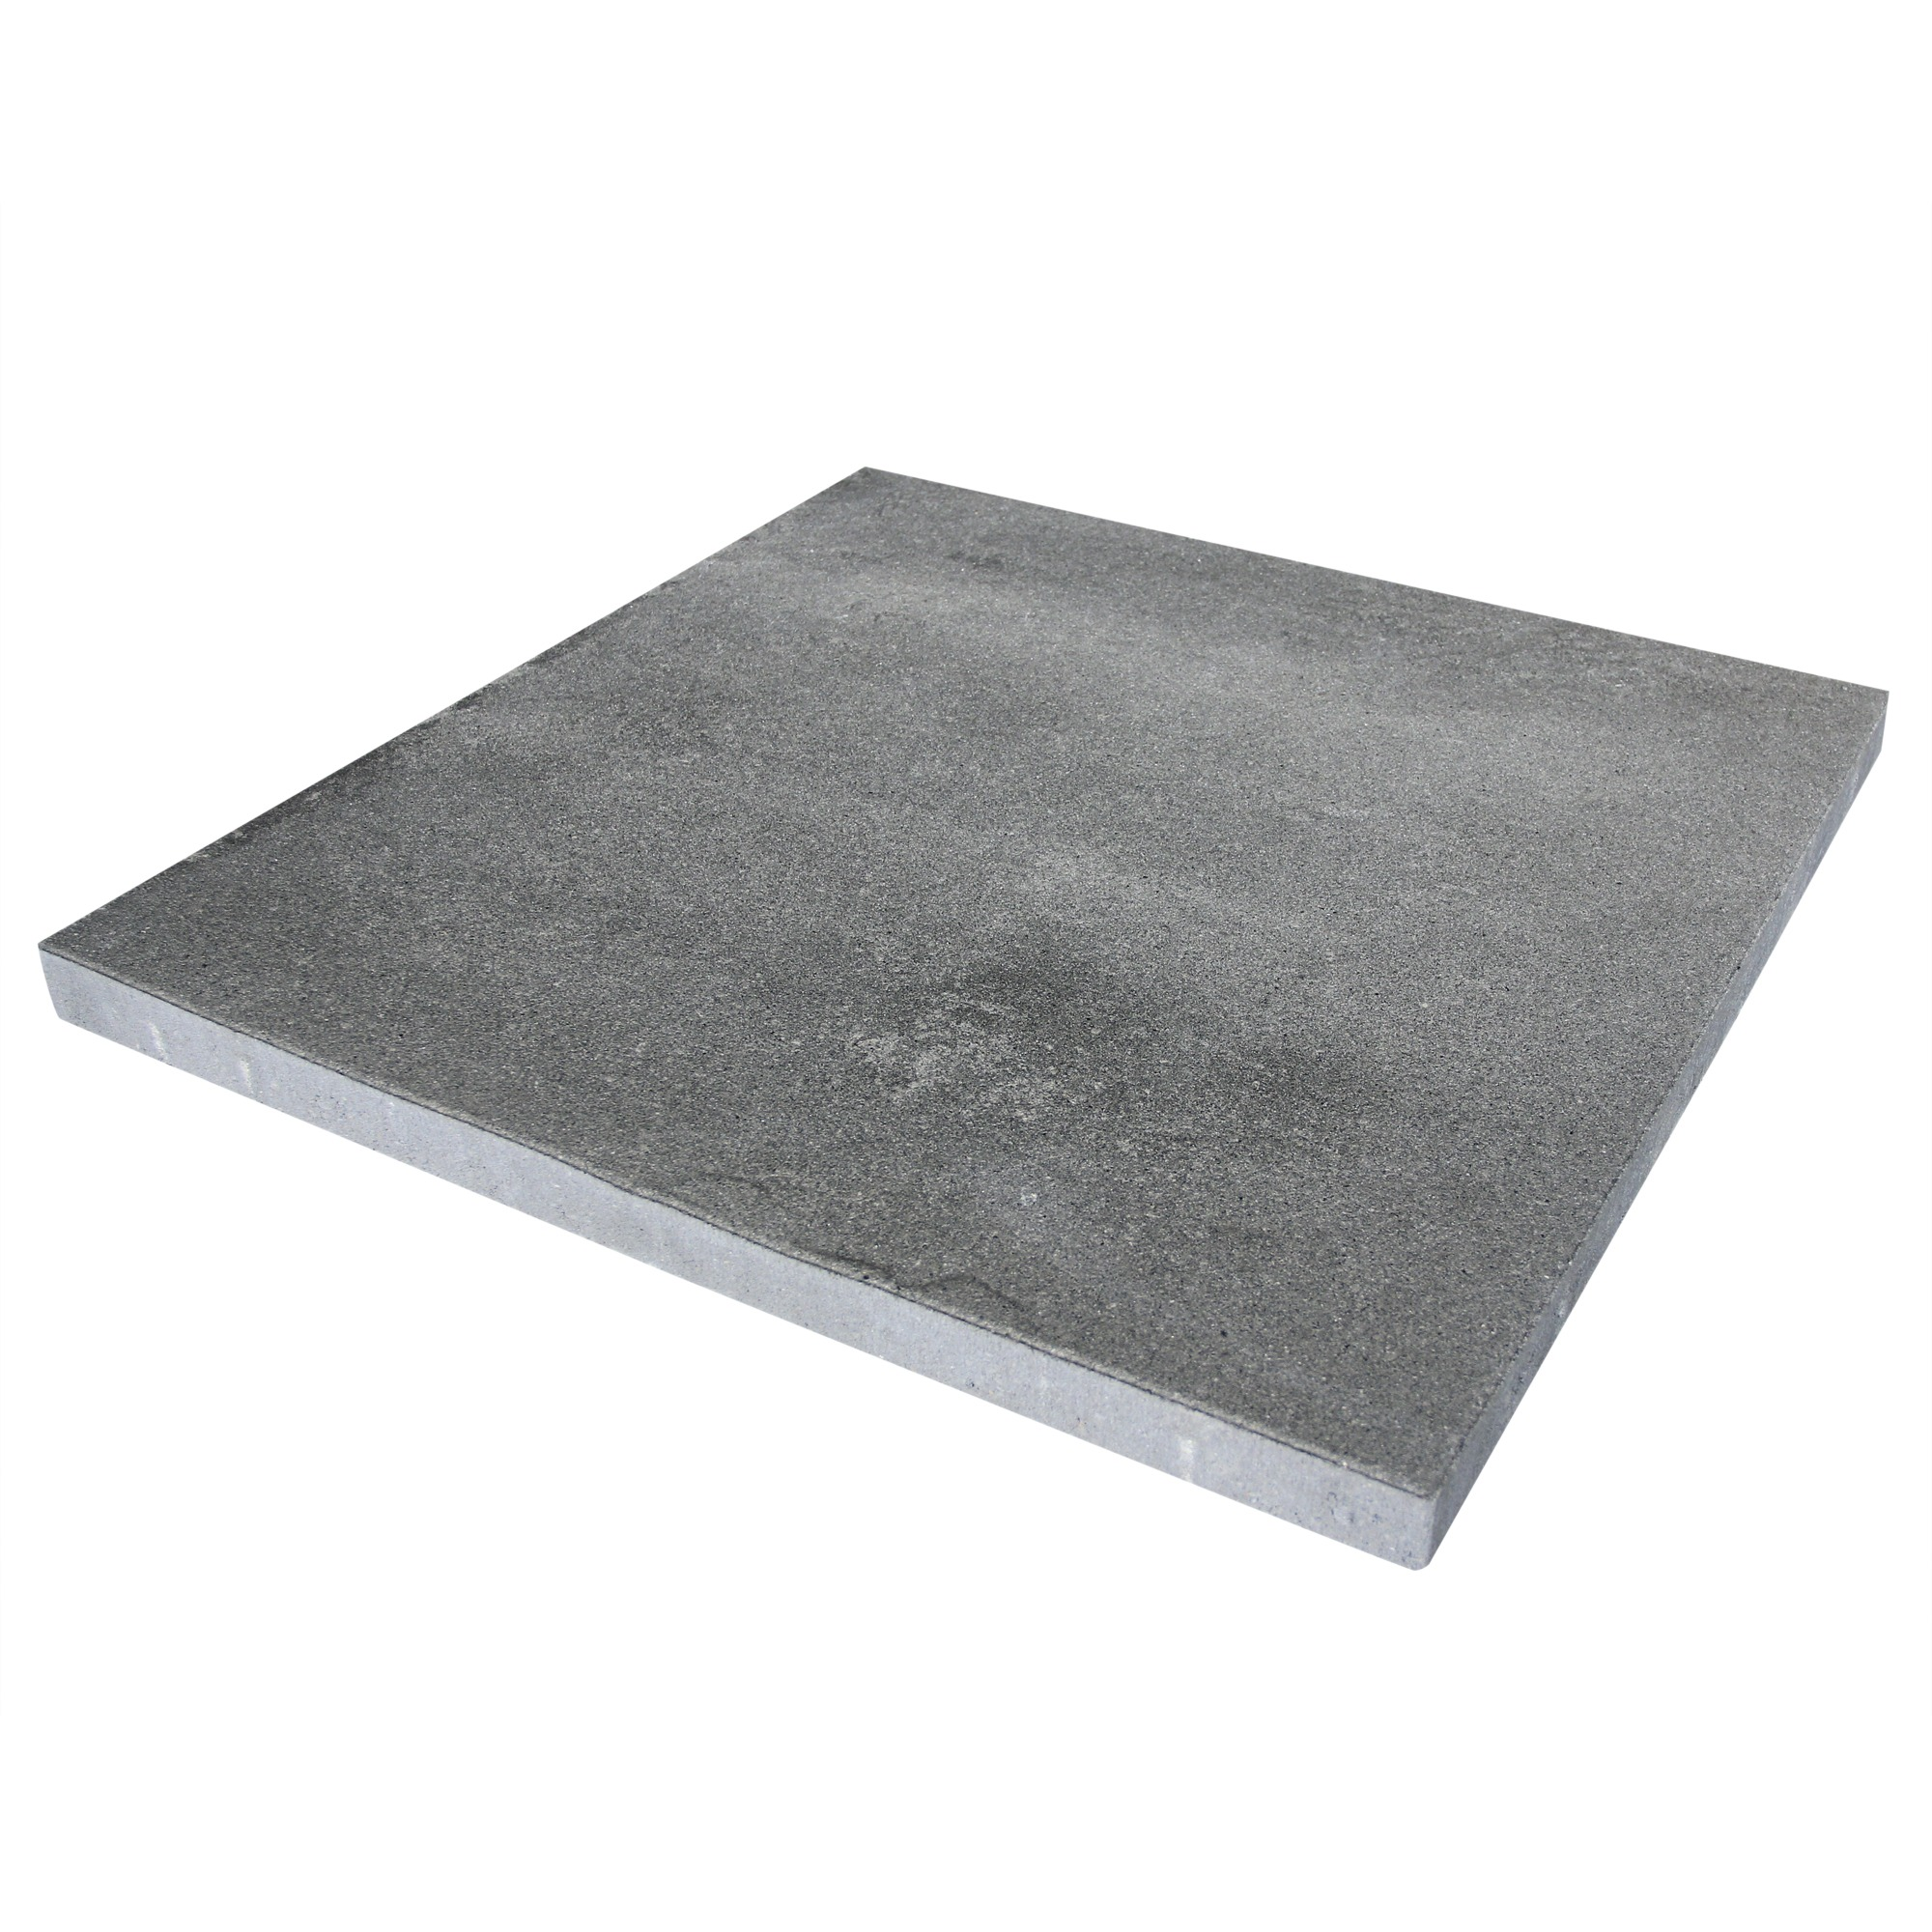 Terrastegel Beton Ardechio Grijs 60x60 cm 36 Tegels-12,96 m2